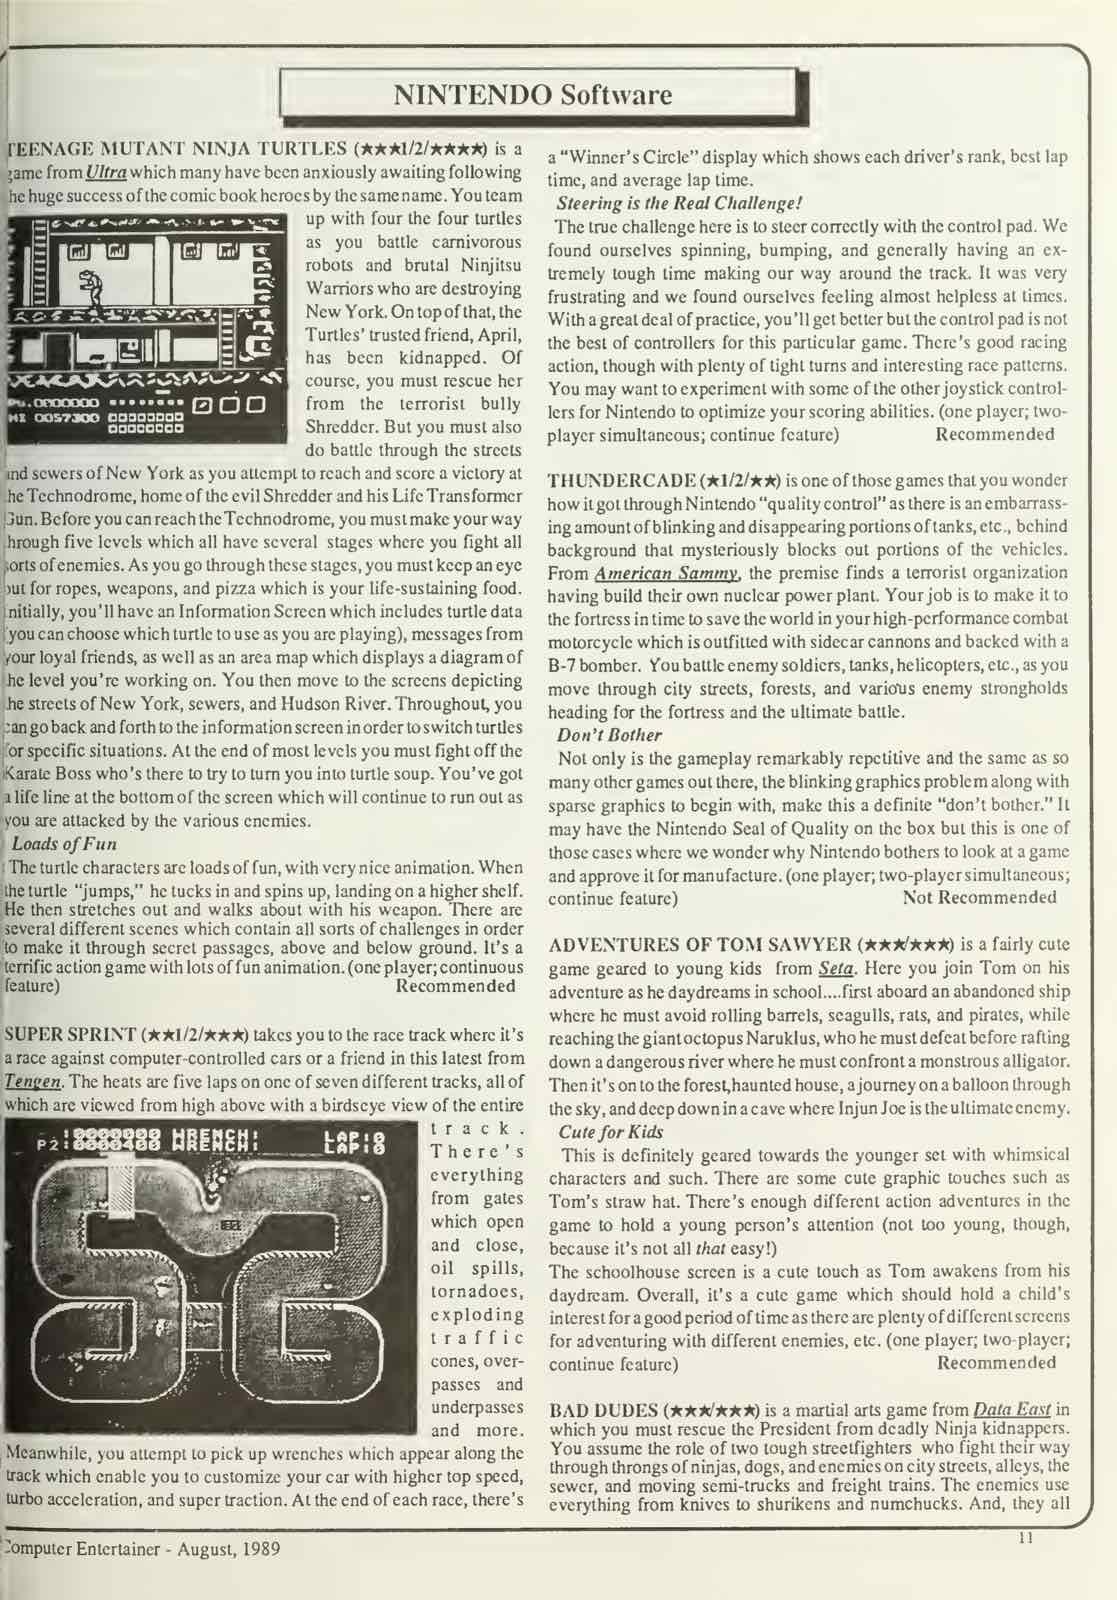 Computer Entertainer | August 1989 p11